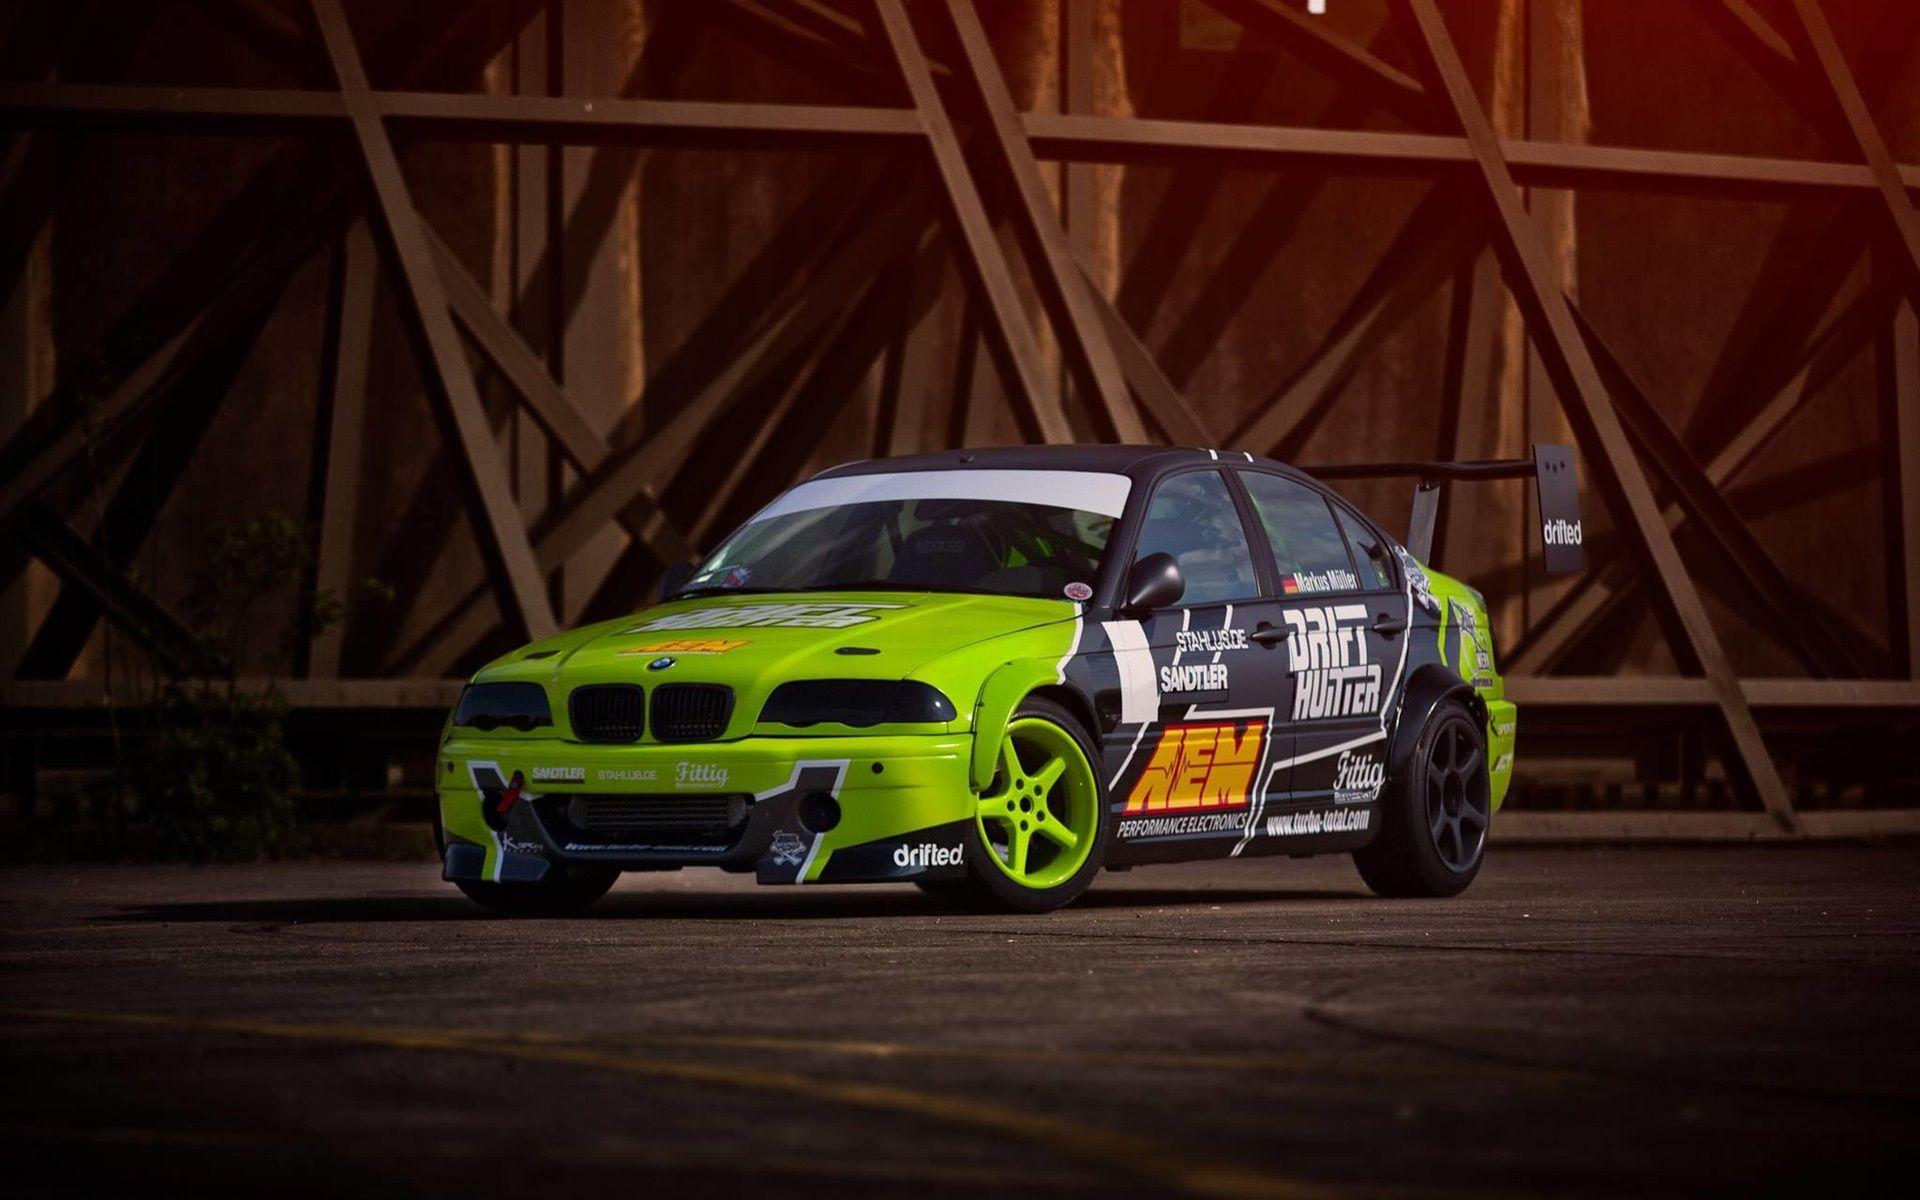 E46 M3 Car Wallpapers Android Wallpaper Car